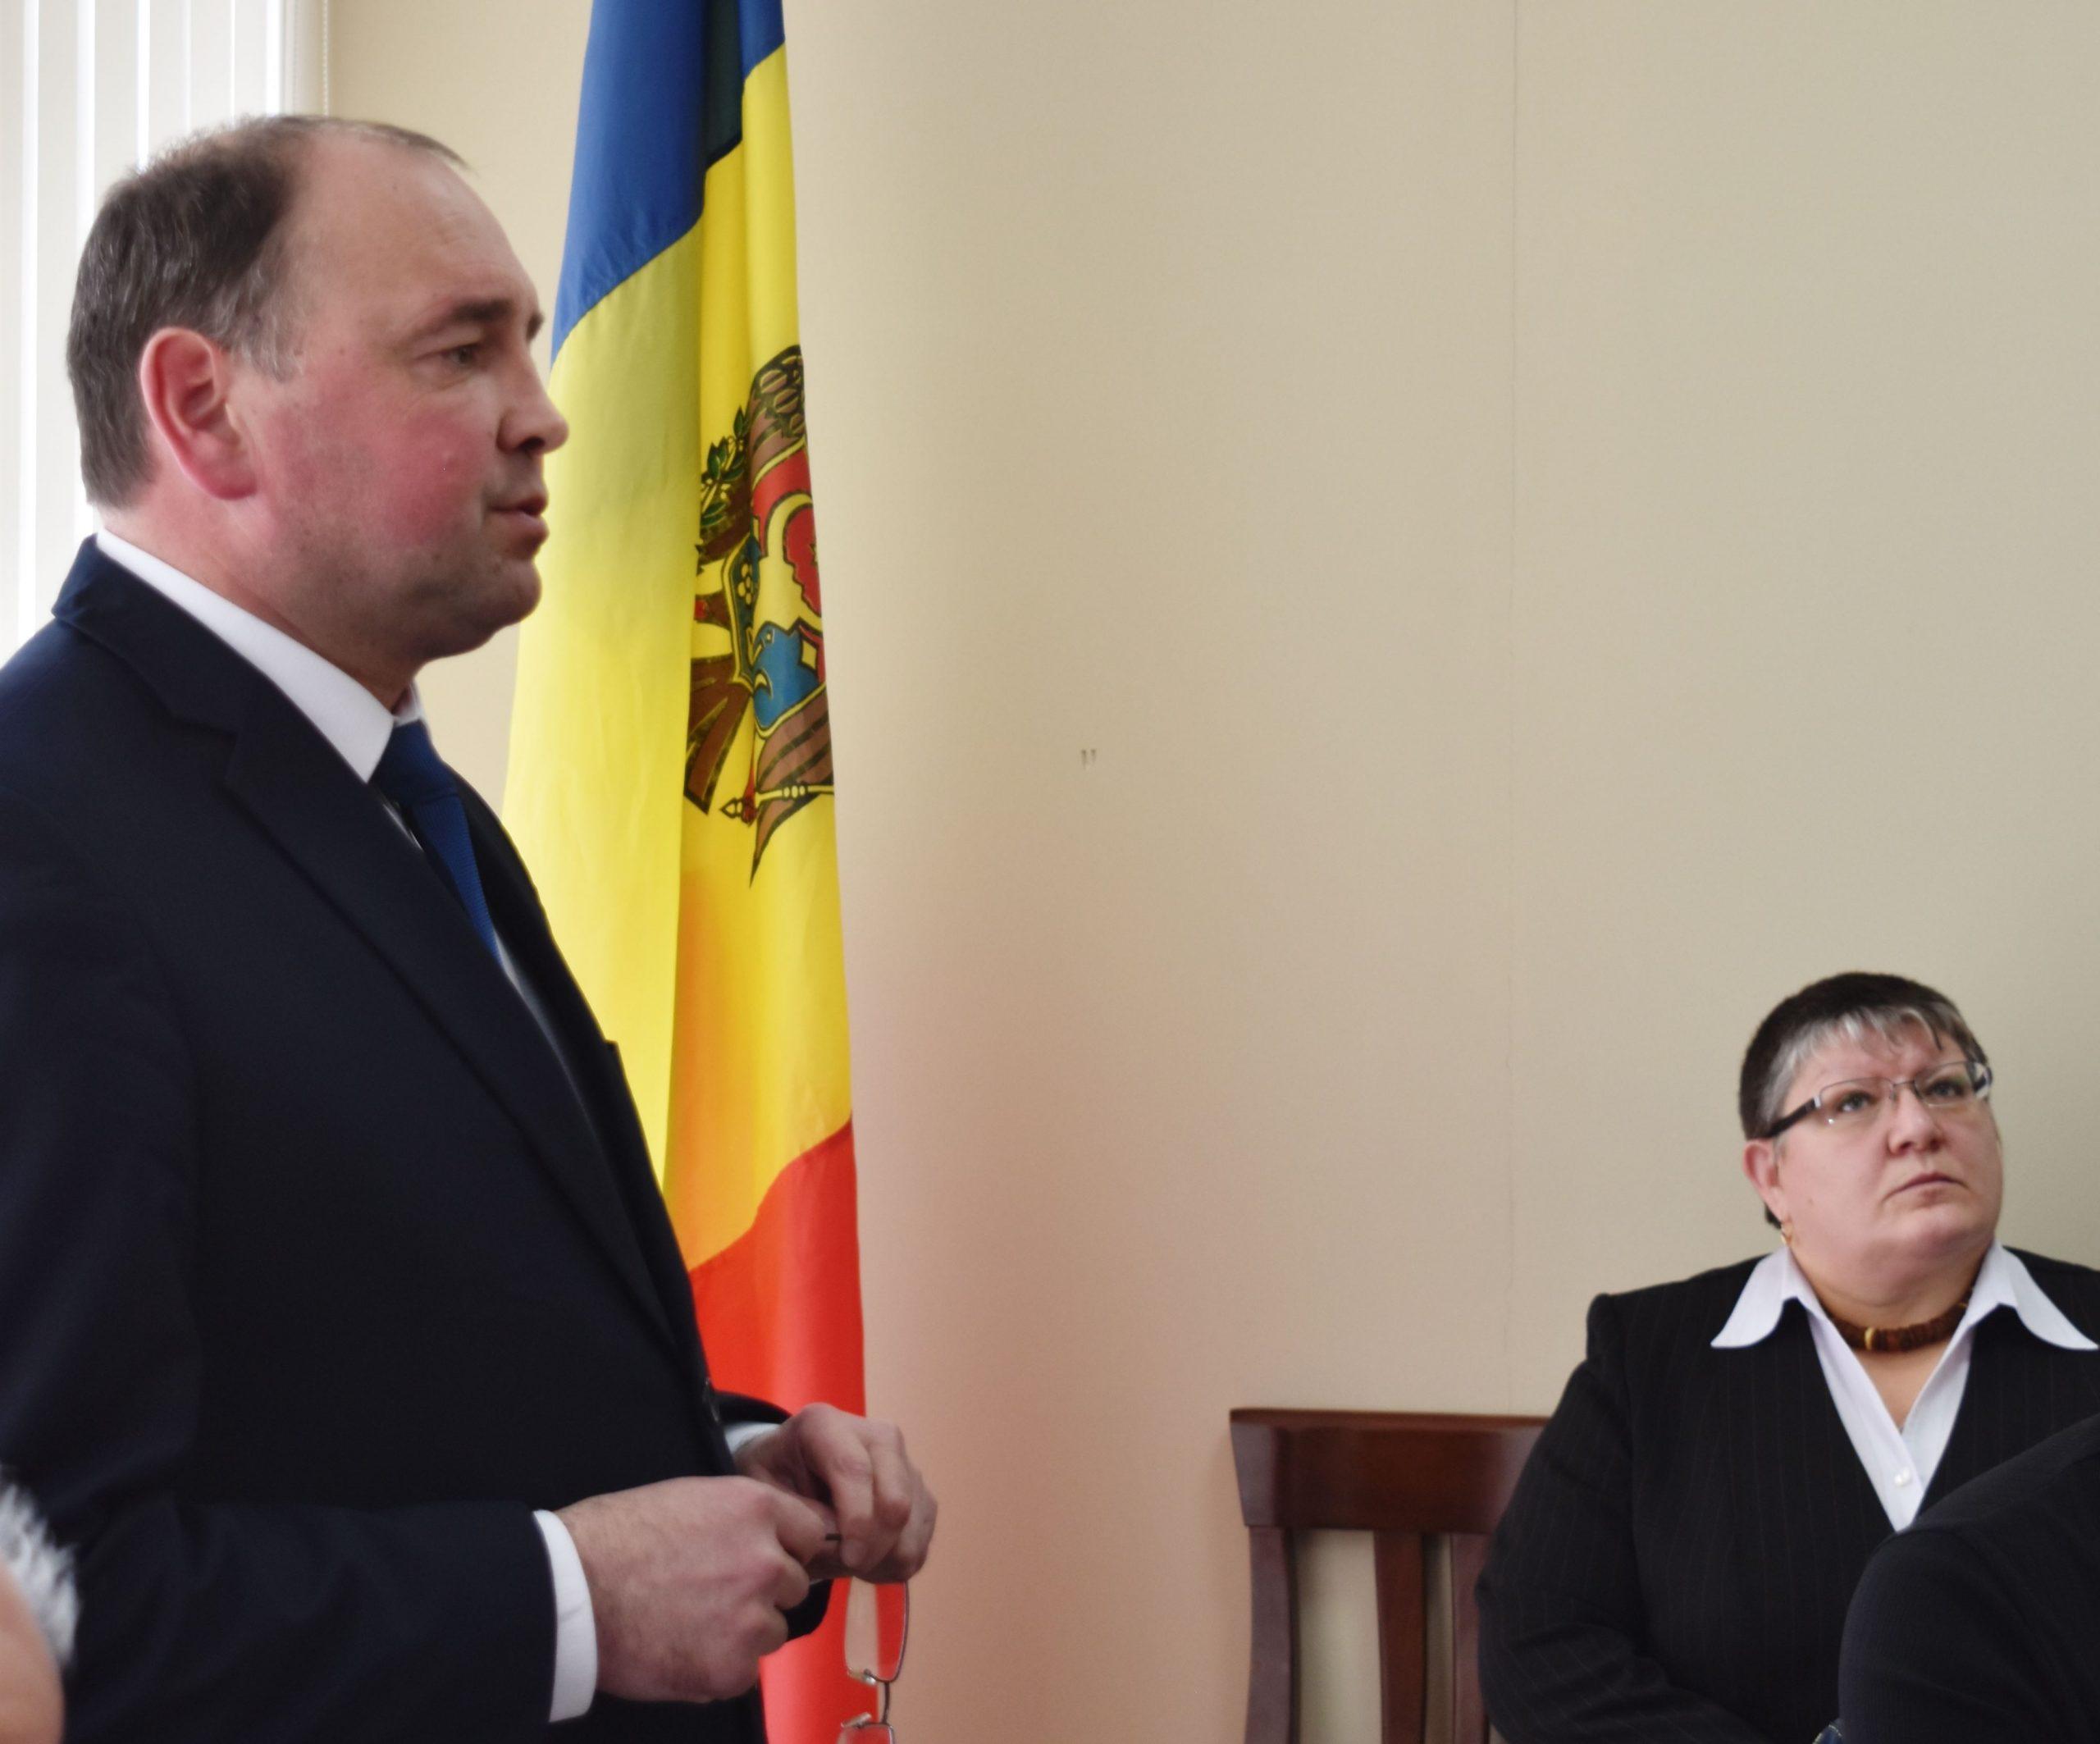 Primarul Alexandru Ambros și candidata la funcția deviceprimar, Lilia Bernic